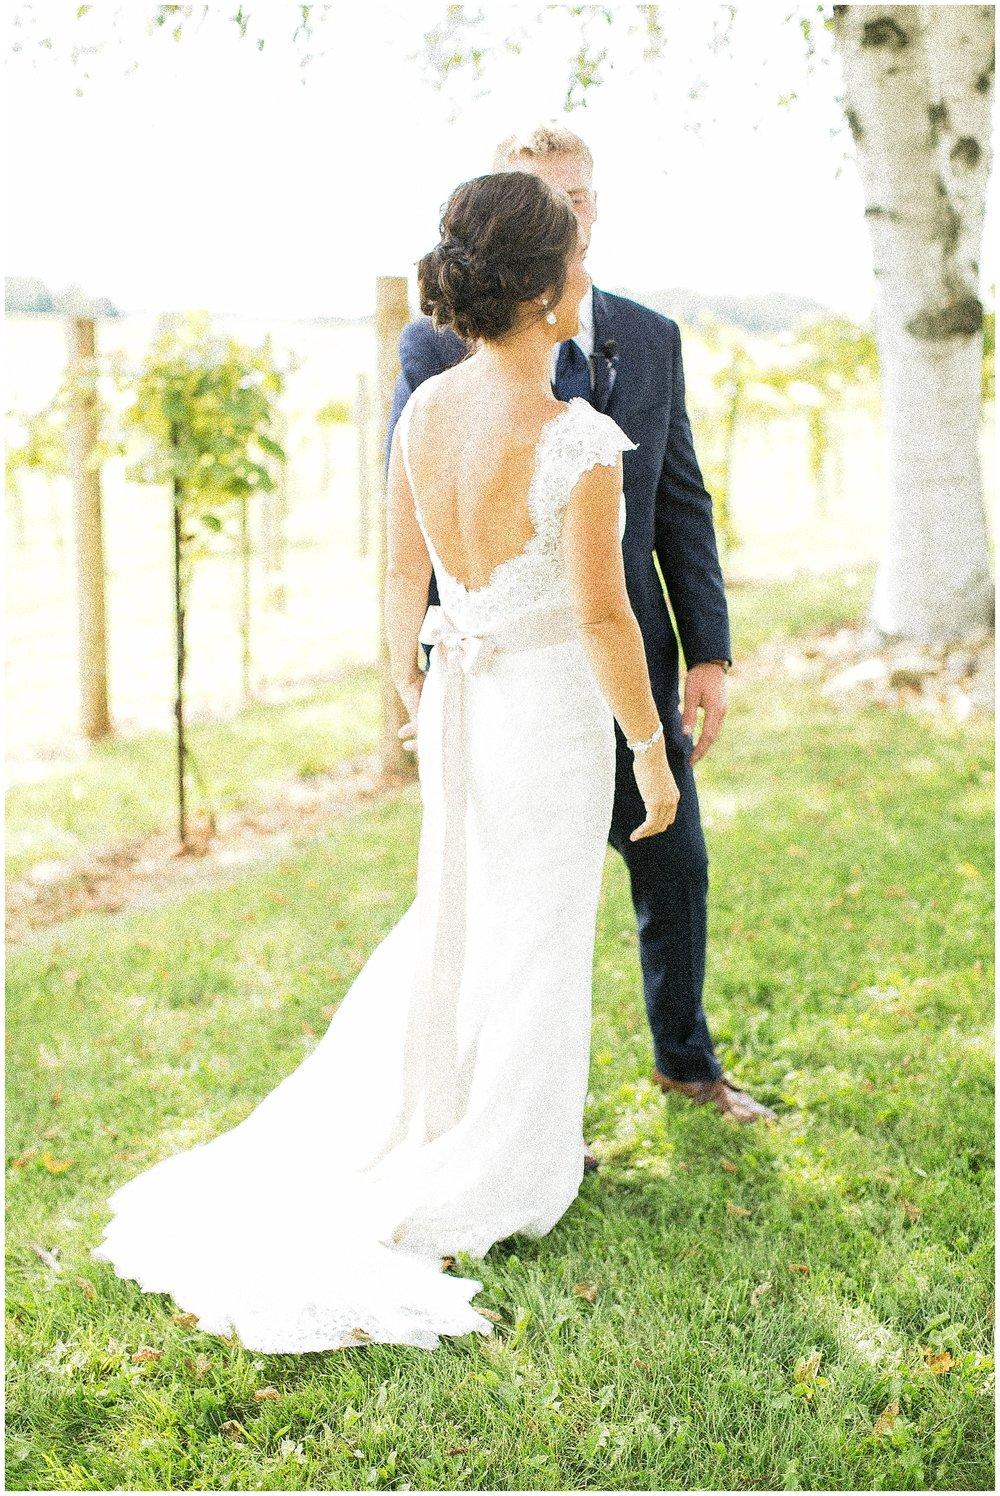 Over_The_Vines_Vineyard_Wedding_Edgerton_Wisconsin_0090.jpg